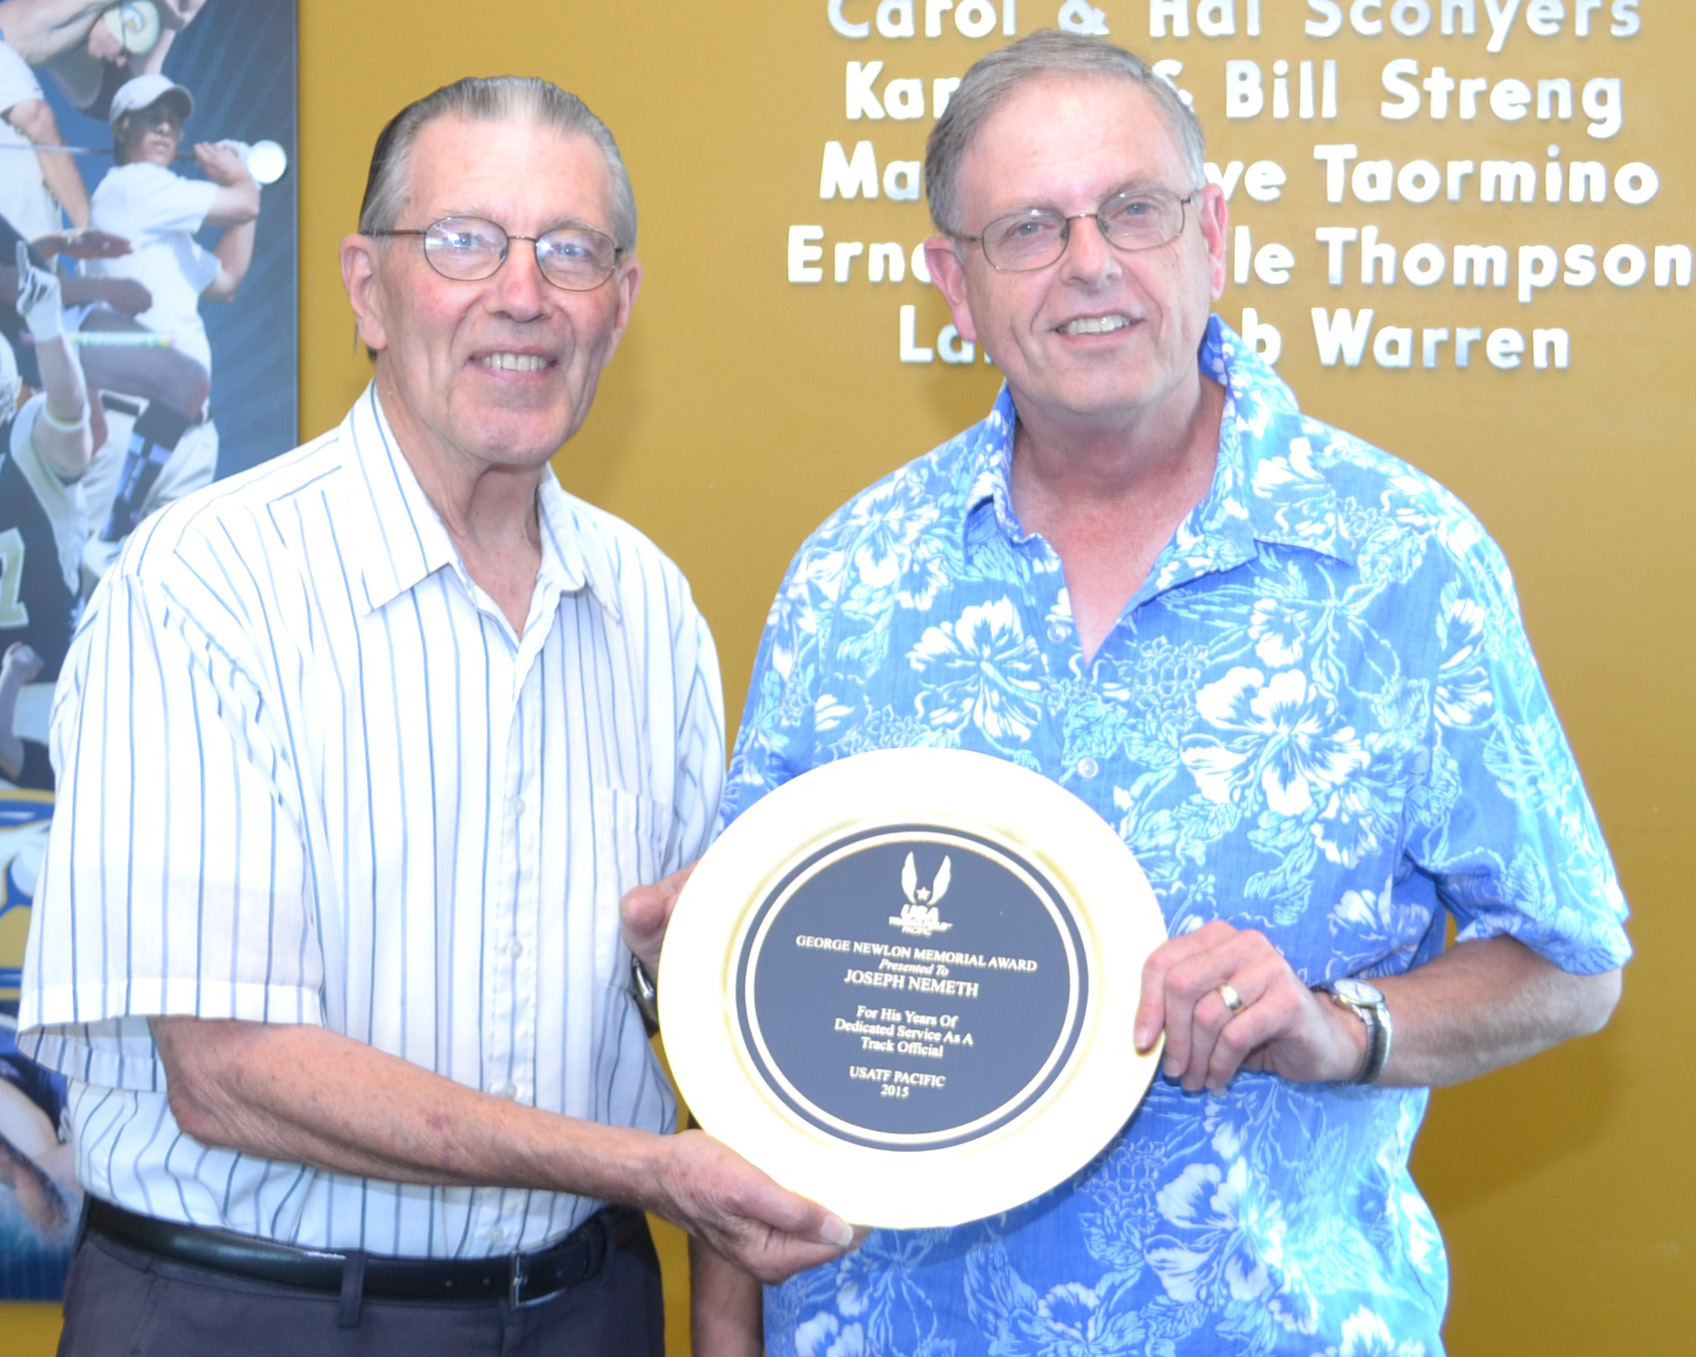 George Newlon Special Recognition Award-Track.Joe Nemeth